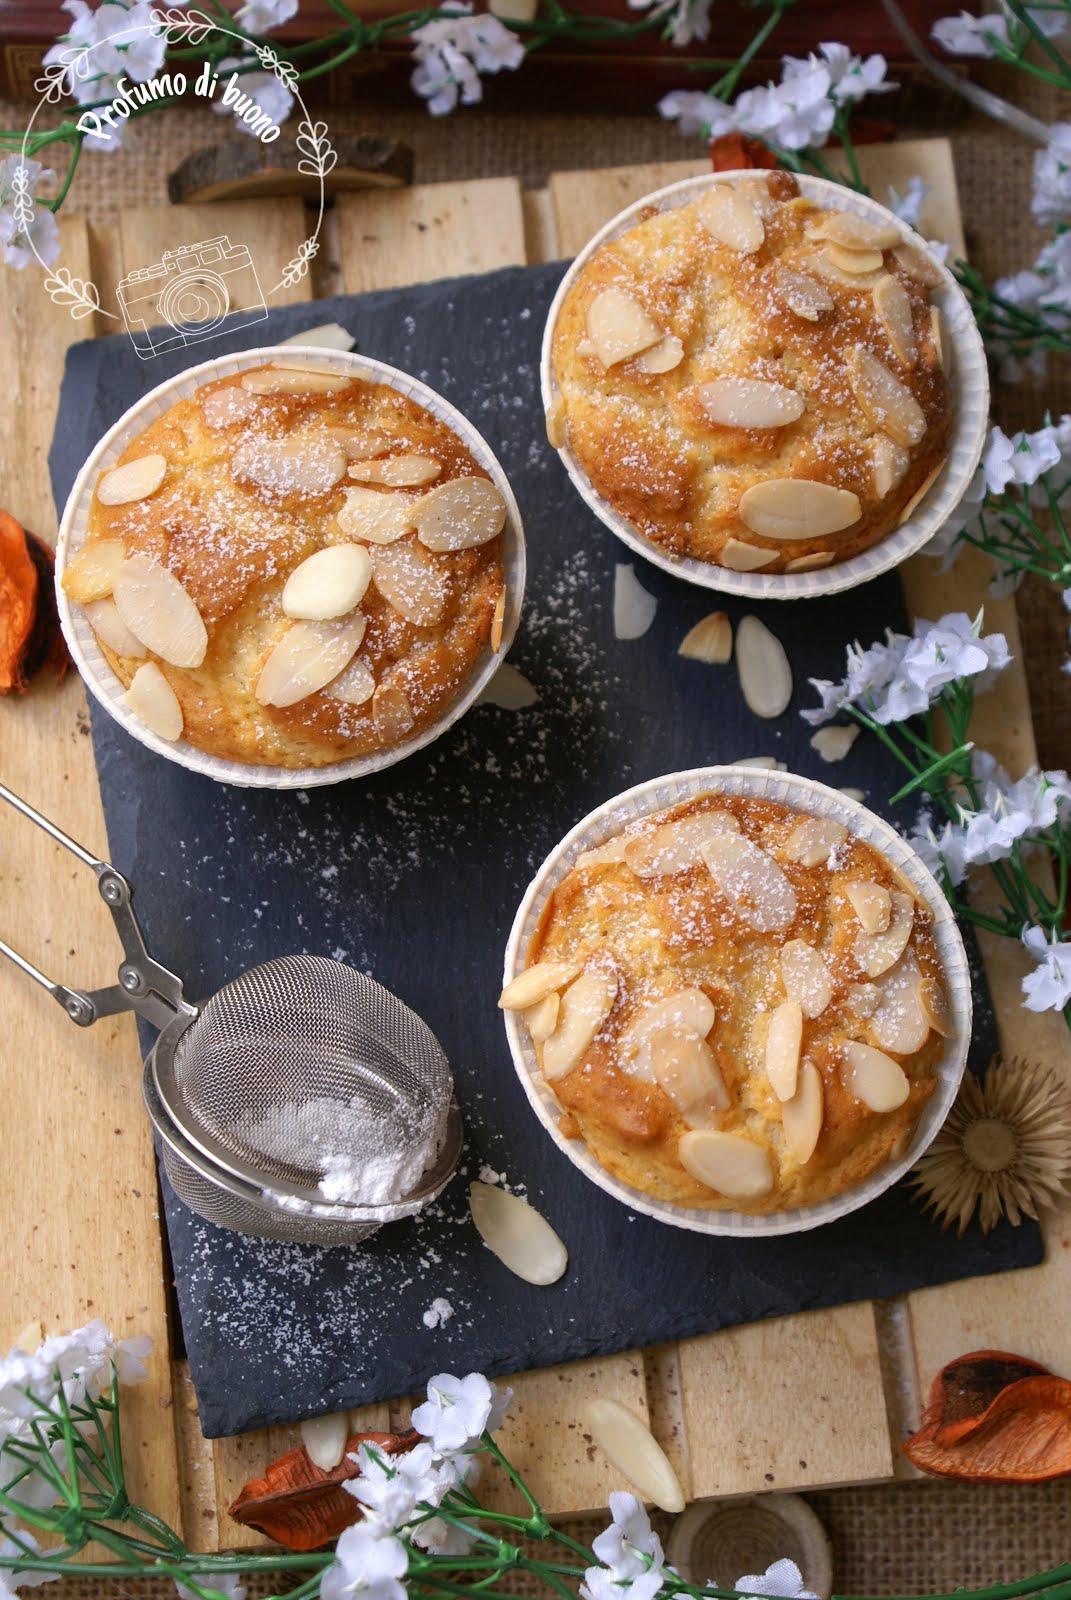 Gluten free yogurt and almond muffins